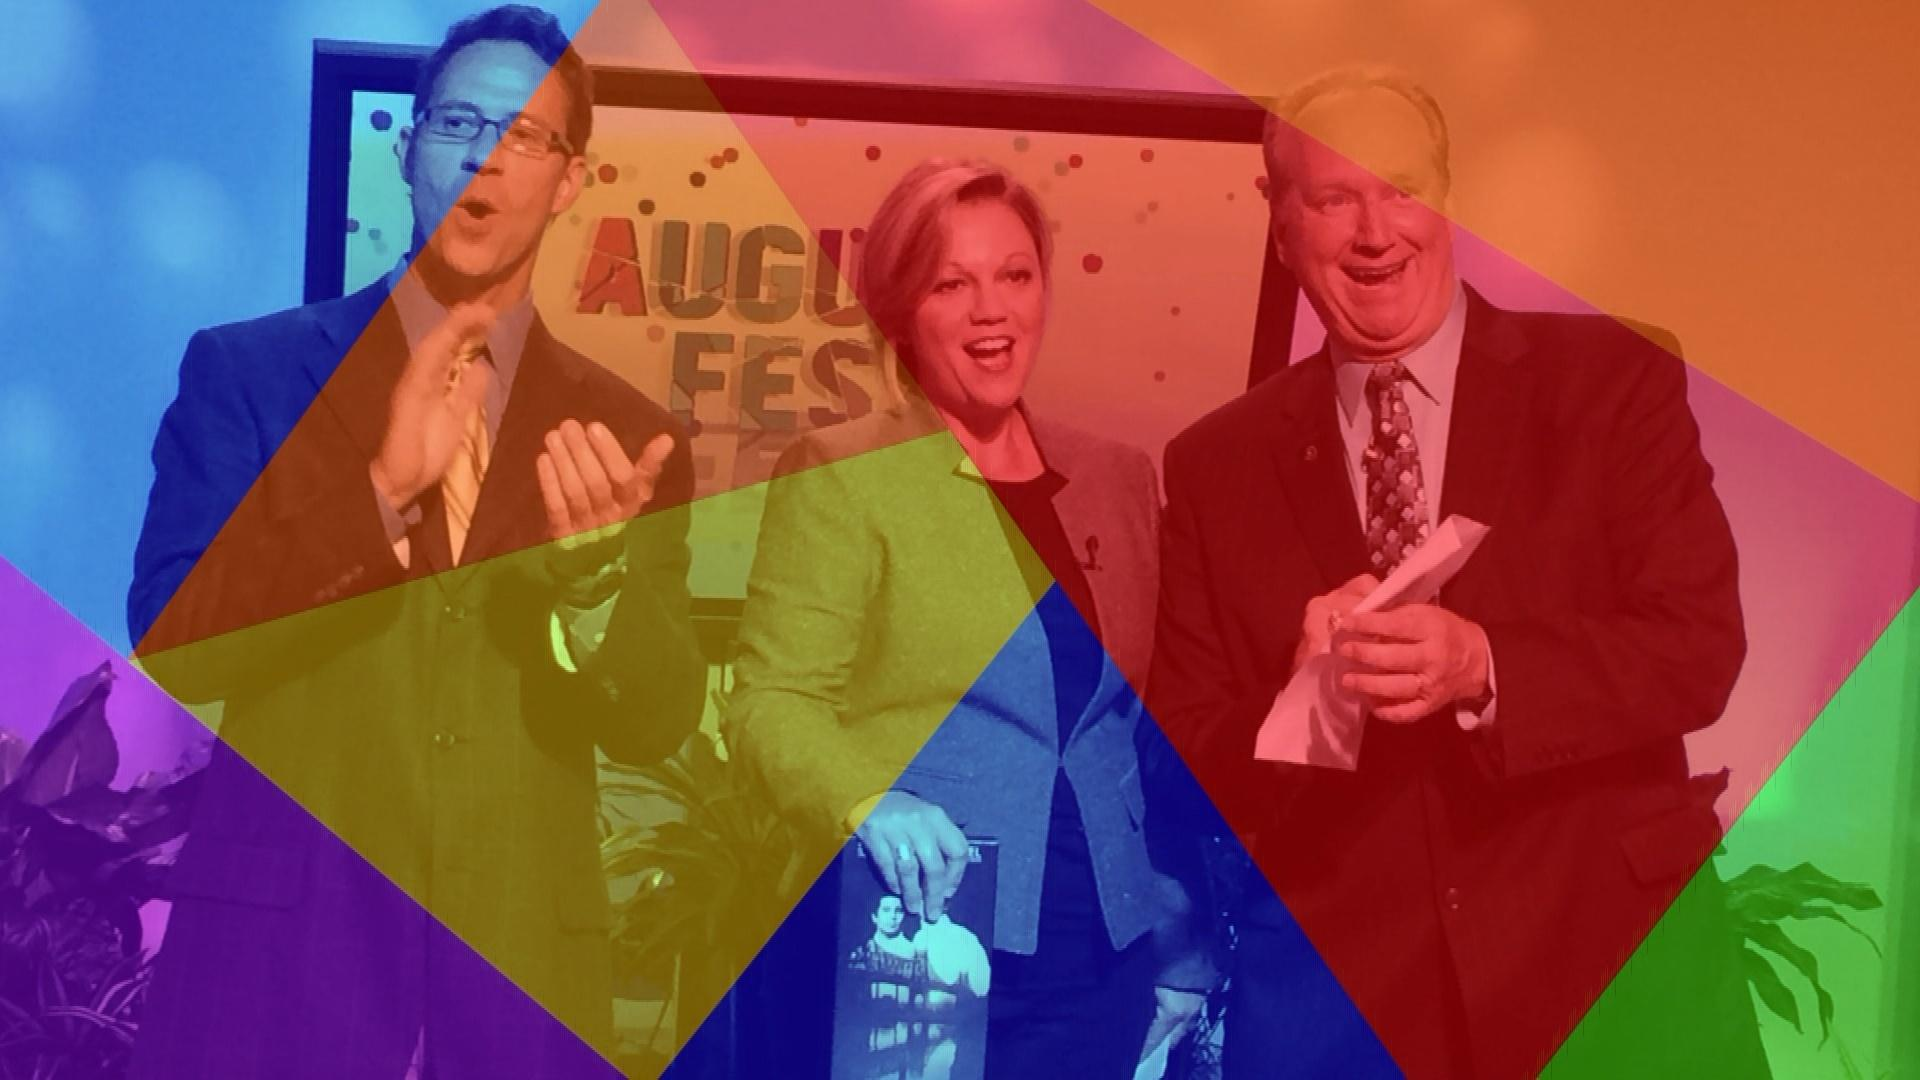 Video Augustfest 2015 Pop Watch Oeta Presents Online